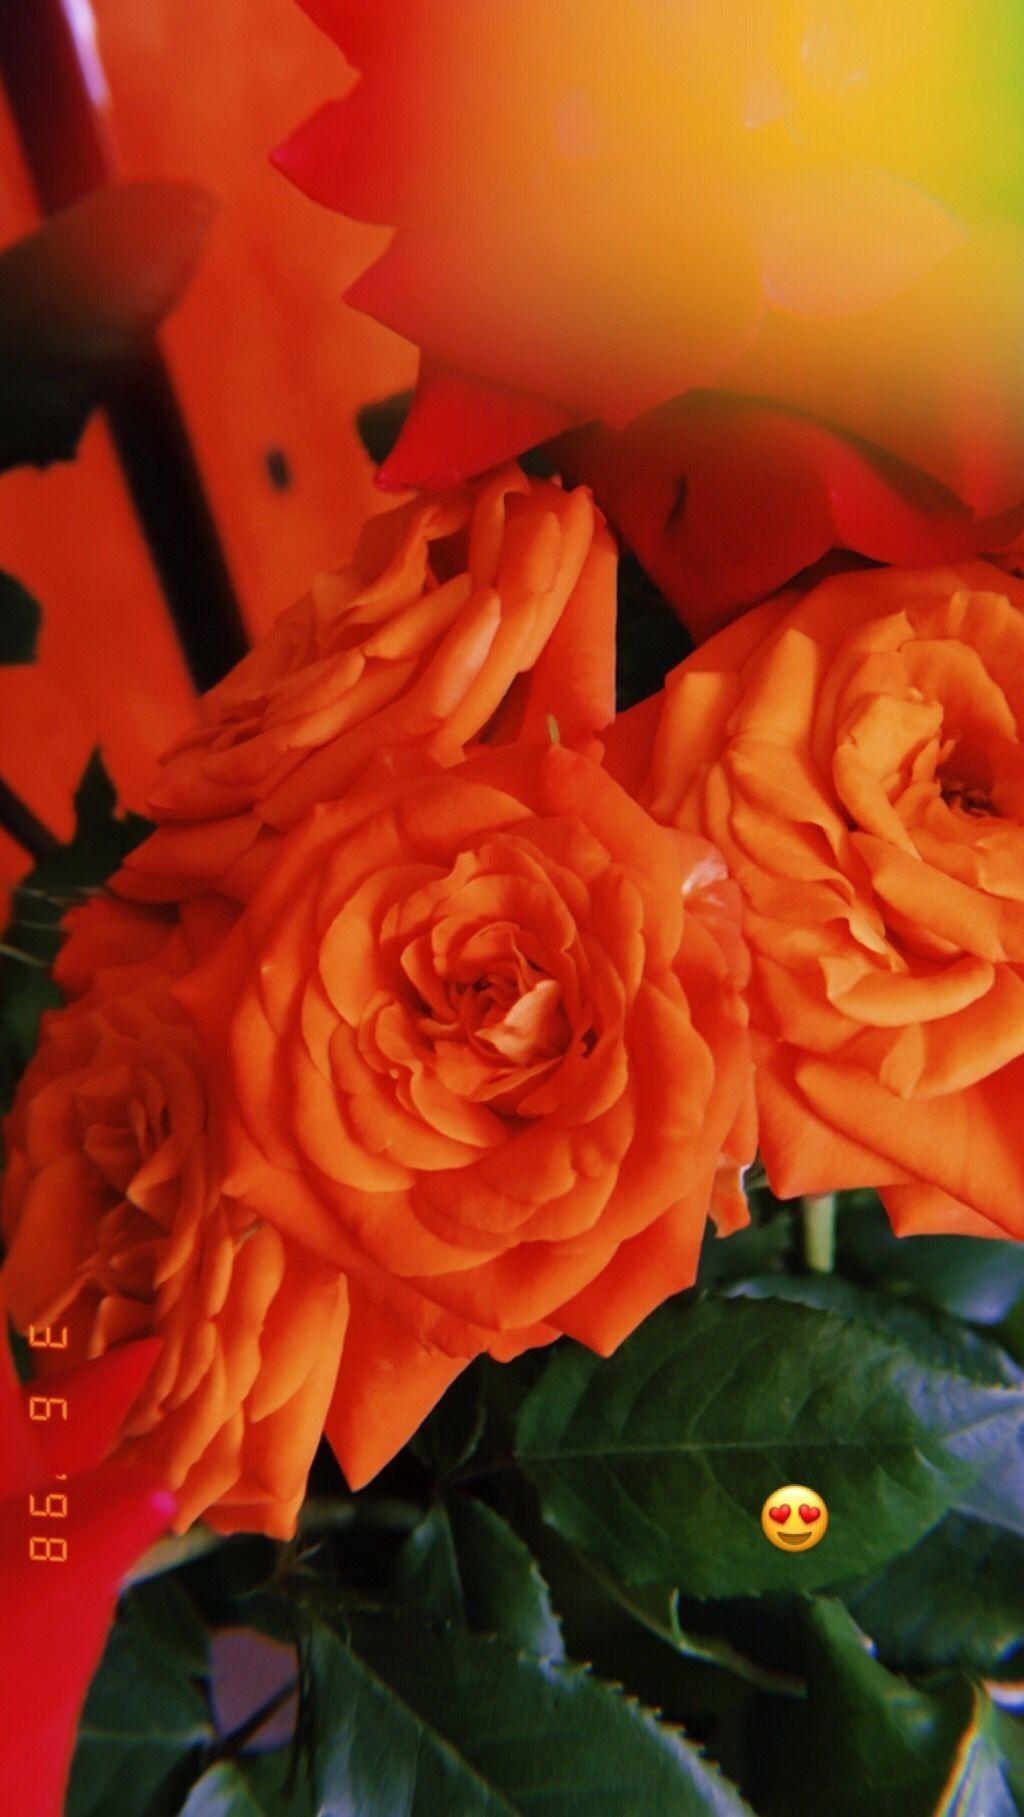 Pin By Eshab On Yeah I Love Flowers Flowers Love Flowers Rose